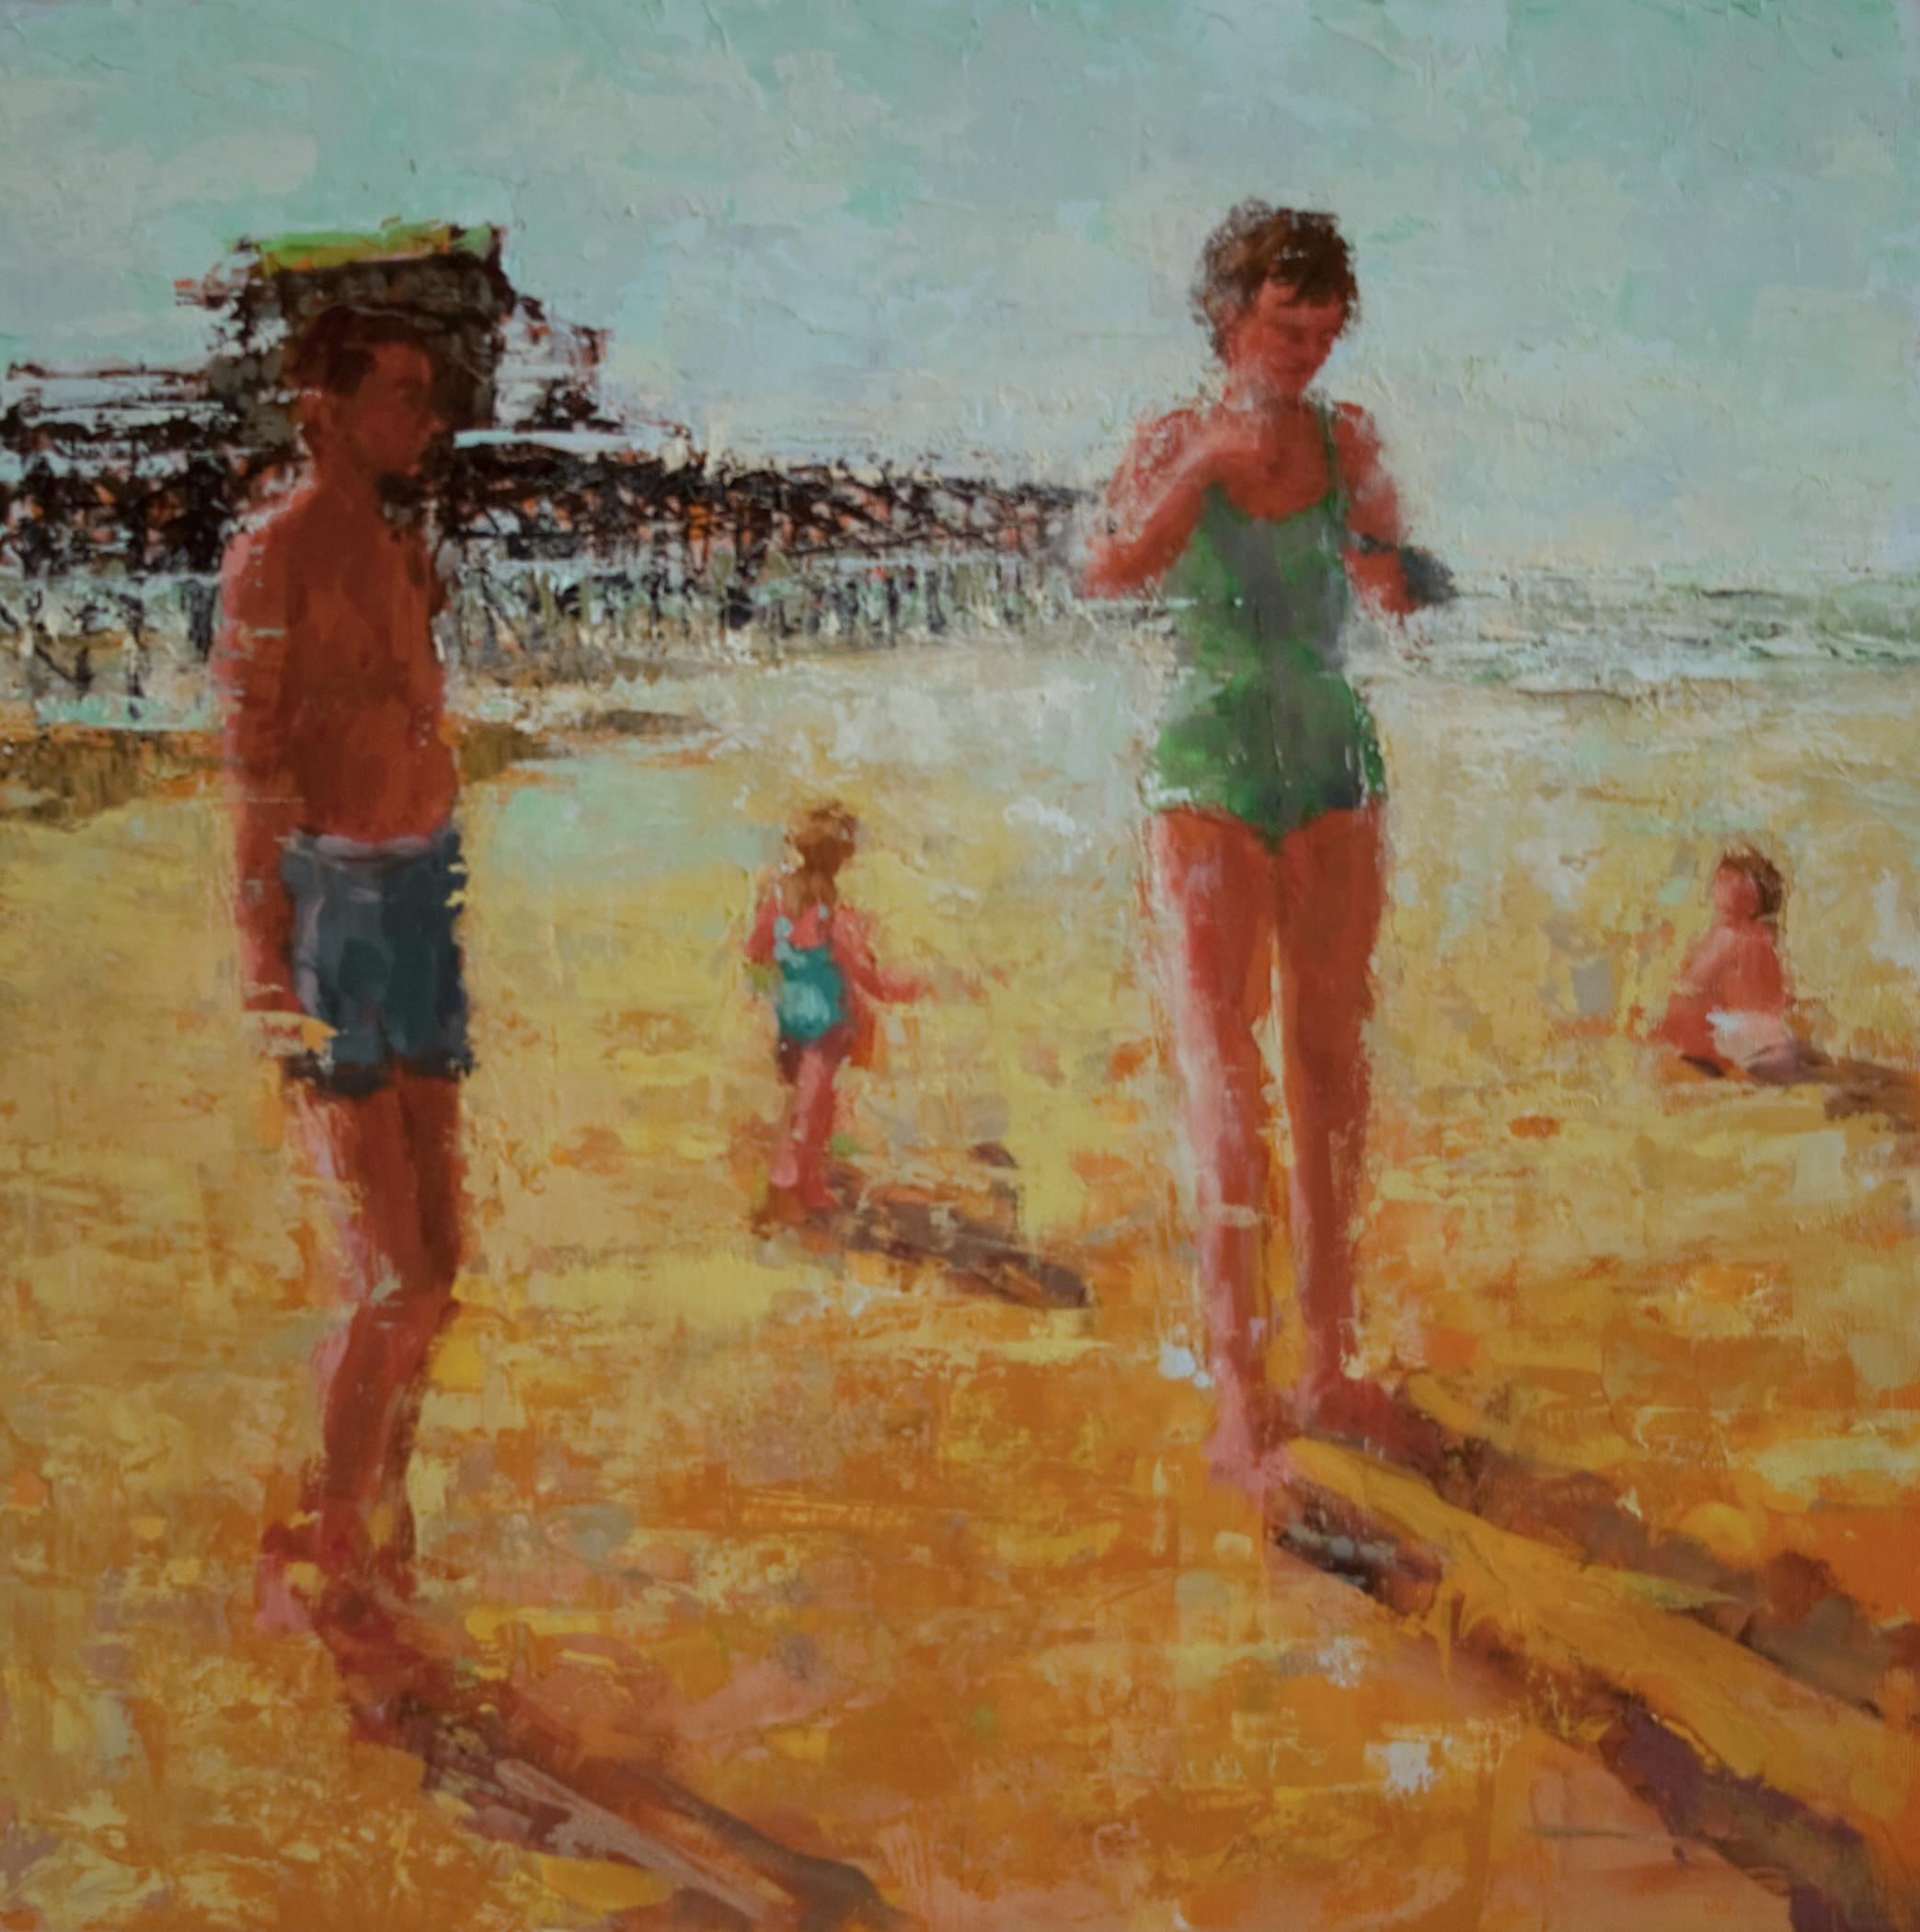 "Springmaid Pier, oil on panel, 12"" x 12"", 2010"